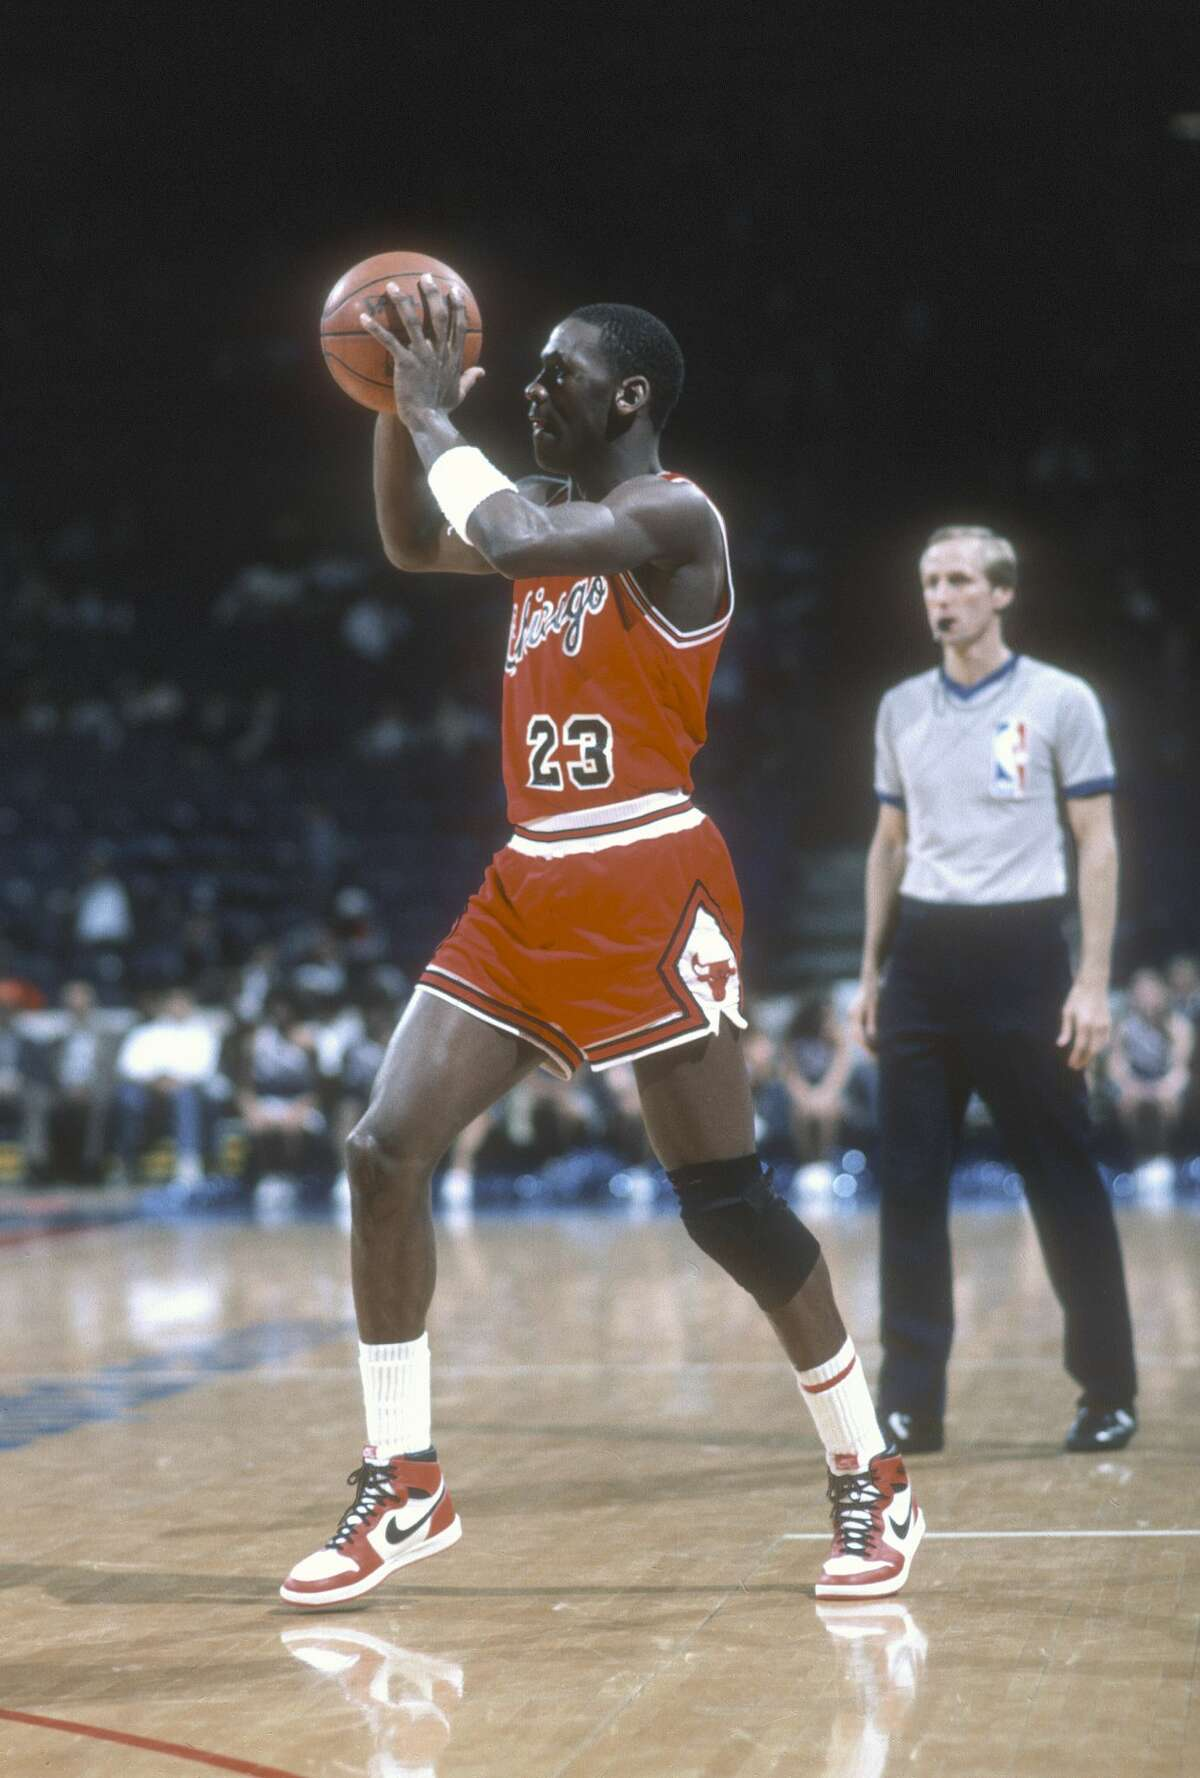 1984-85March 19, 1985 (at Houston): Rockets 106, Bulls 100Michael Jordan: 31 points, 7 assistsRockets' leader: Akeem Olajuwon 24 points, 21 rebounds, 4 blocks